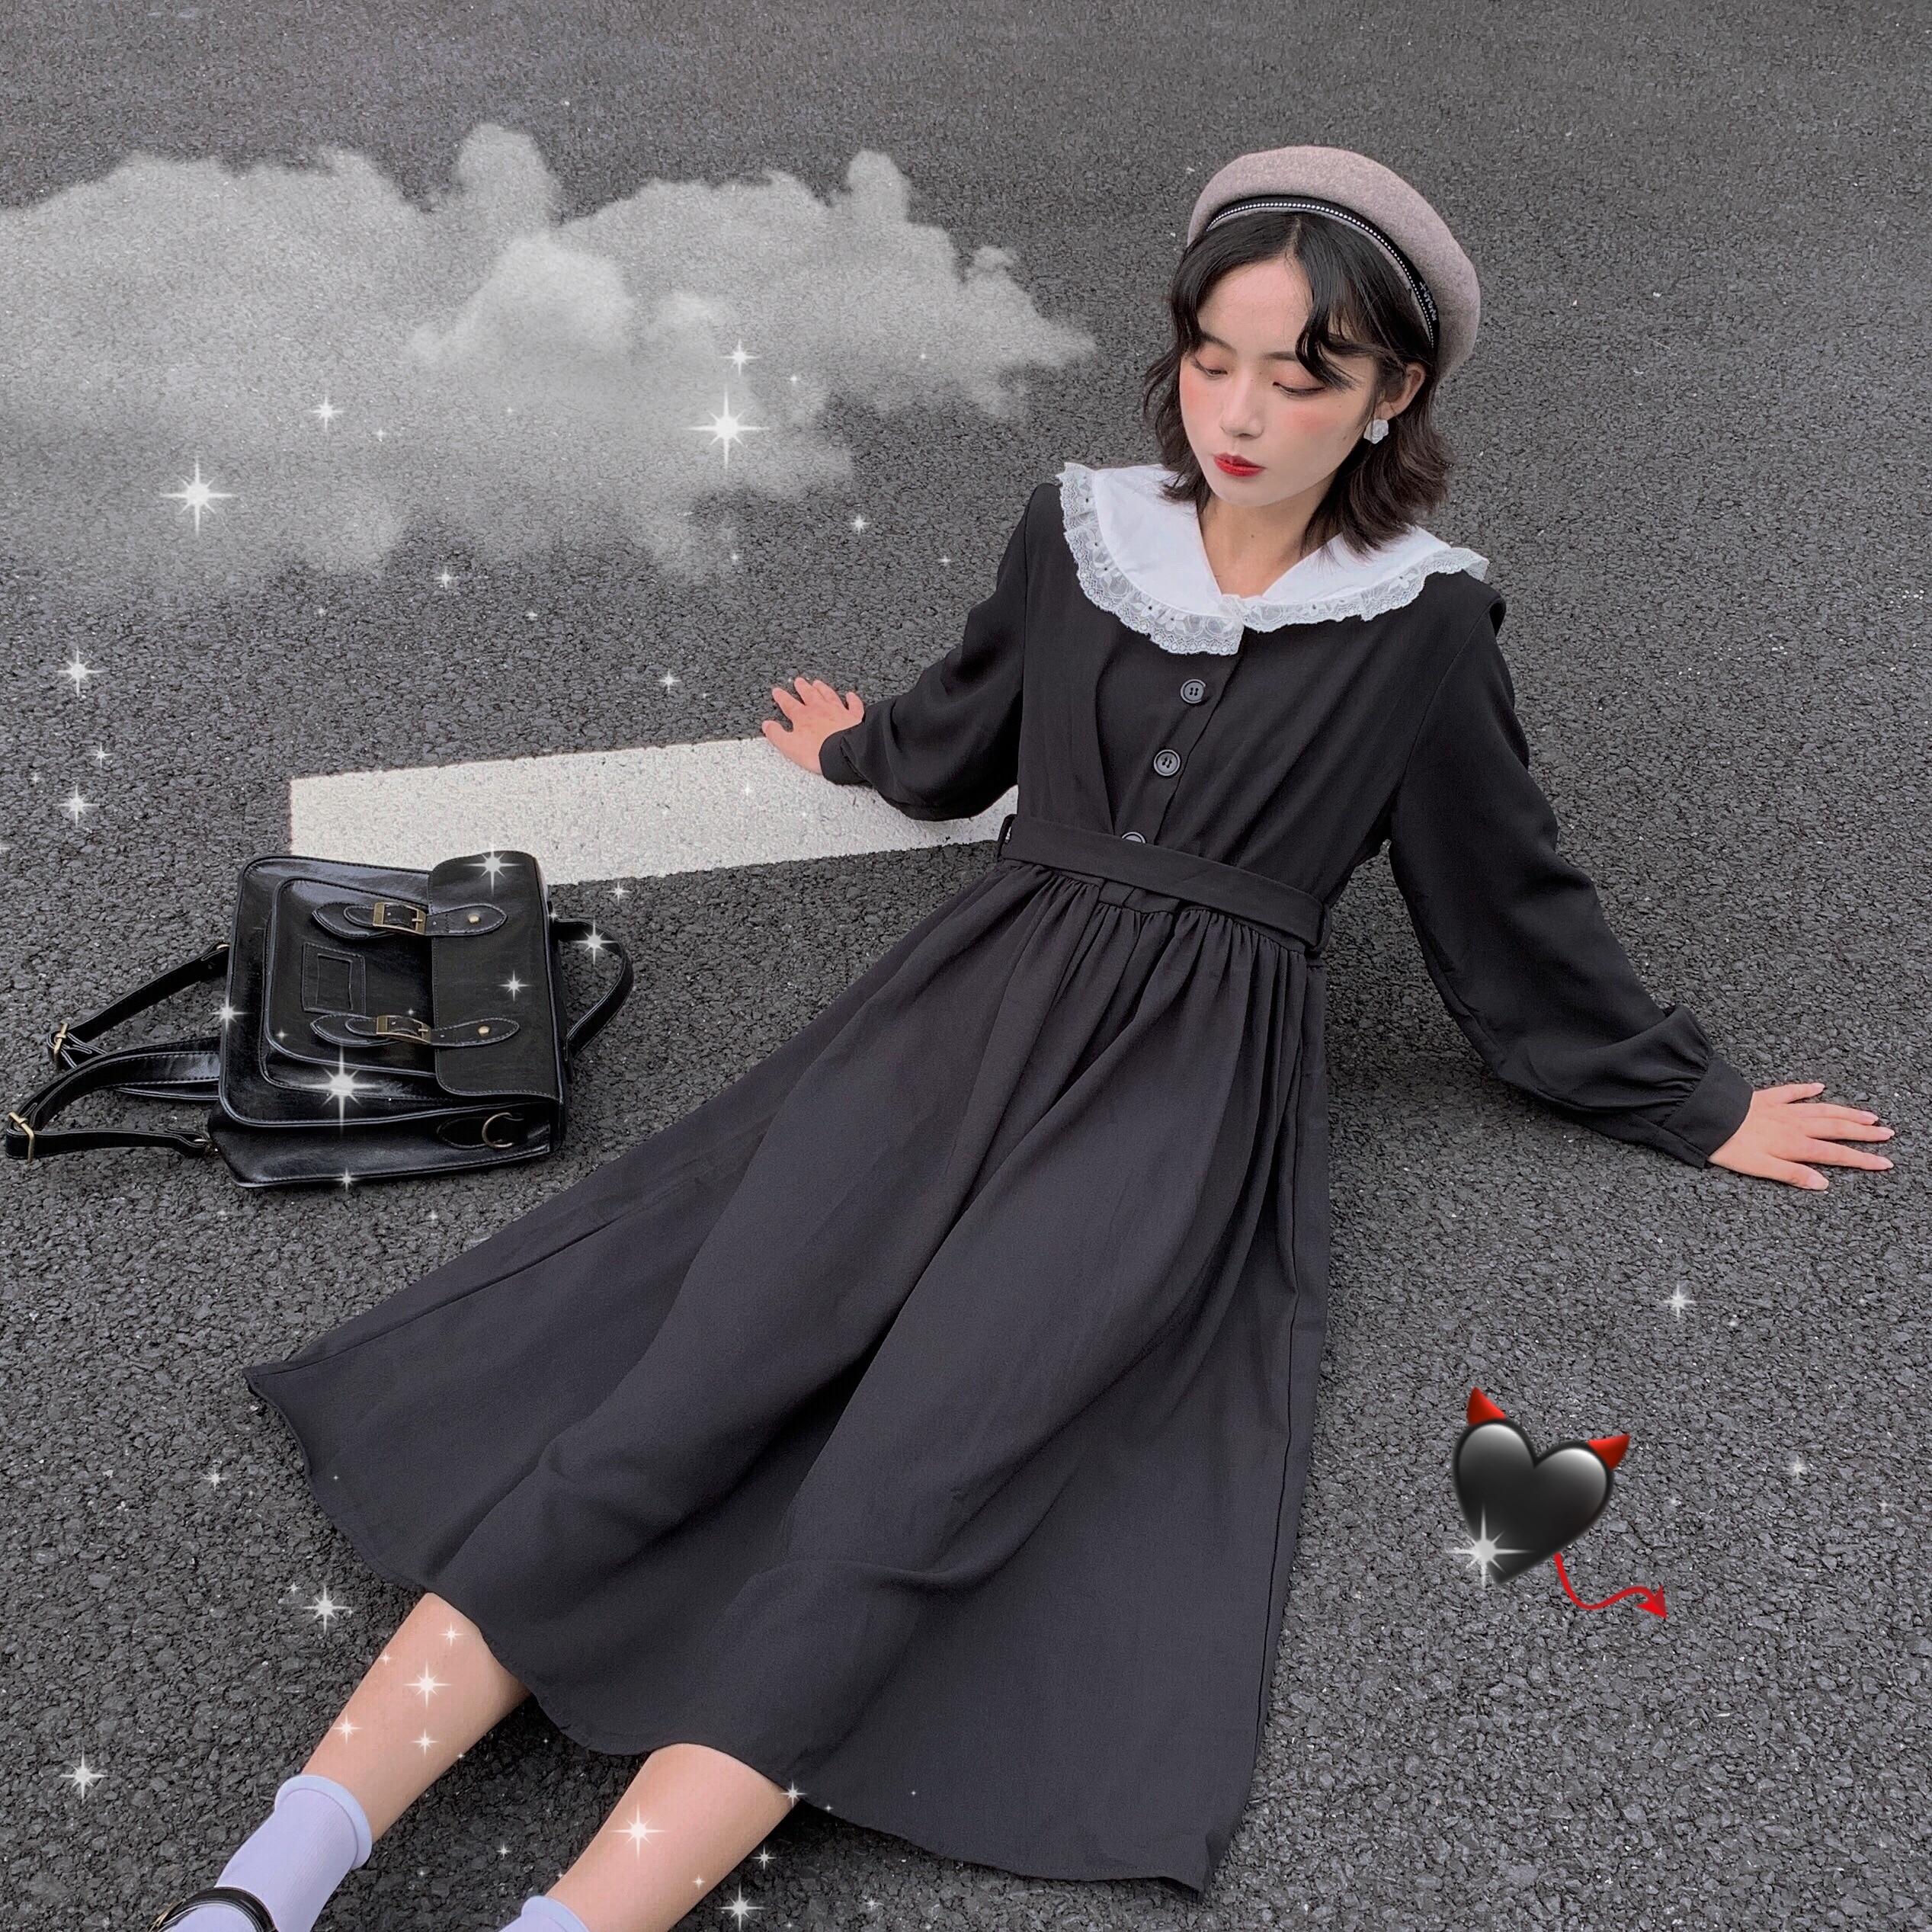 Dress Women Dark Fashion Preppy Style Long Sleeve Lolita Dresses Japanese Sweet Peter Pan Collar Long Ladies Elegant Dresses